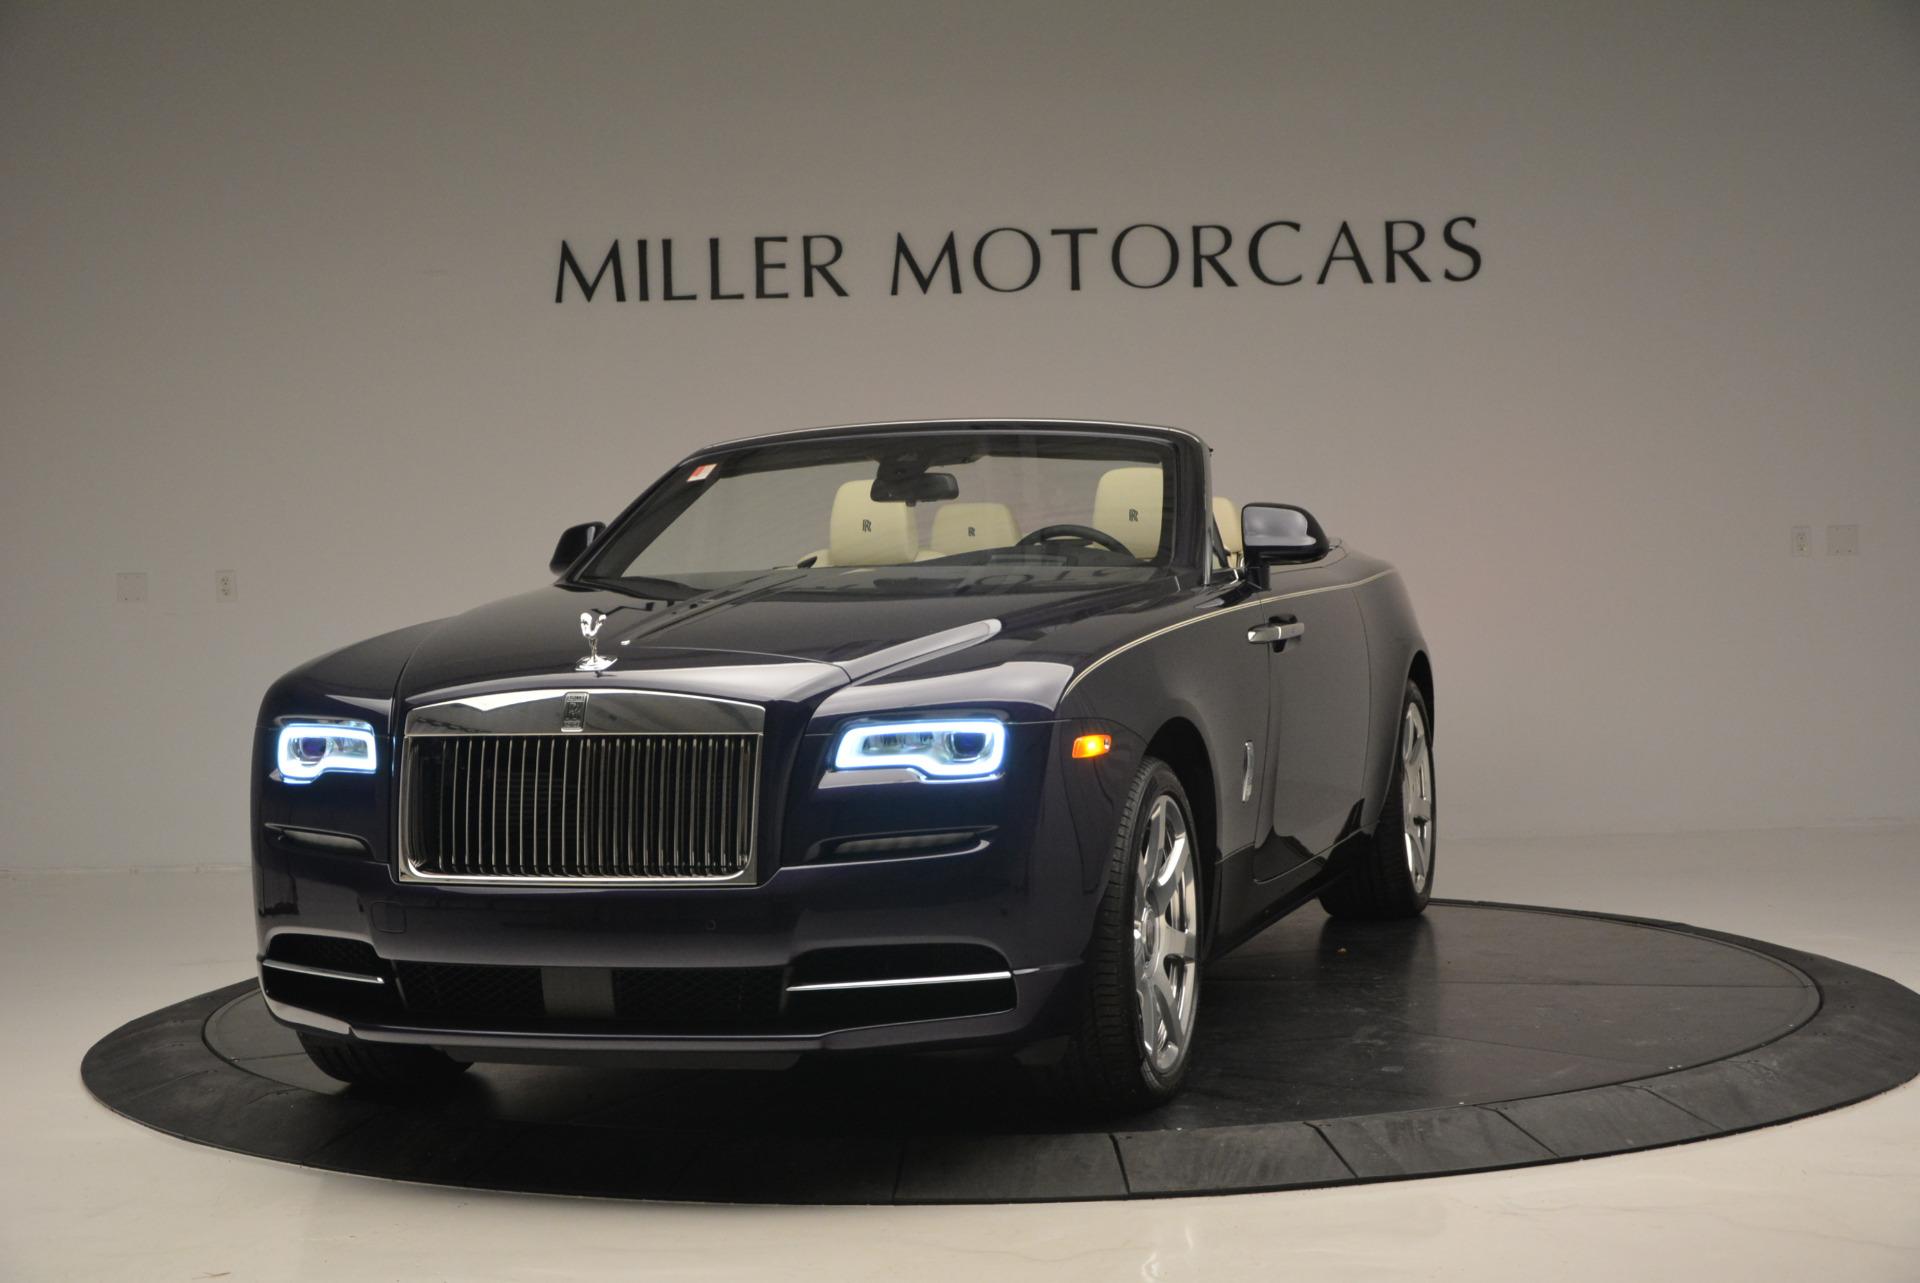 New 2016 Rolls-Royce Dawn for sale Sold at Rolls-Royce Motor Cars Greenwich in Greenwich CT 06830 1